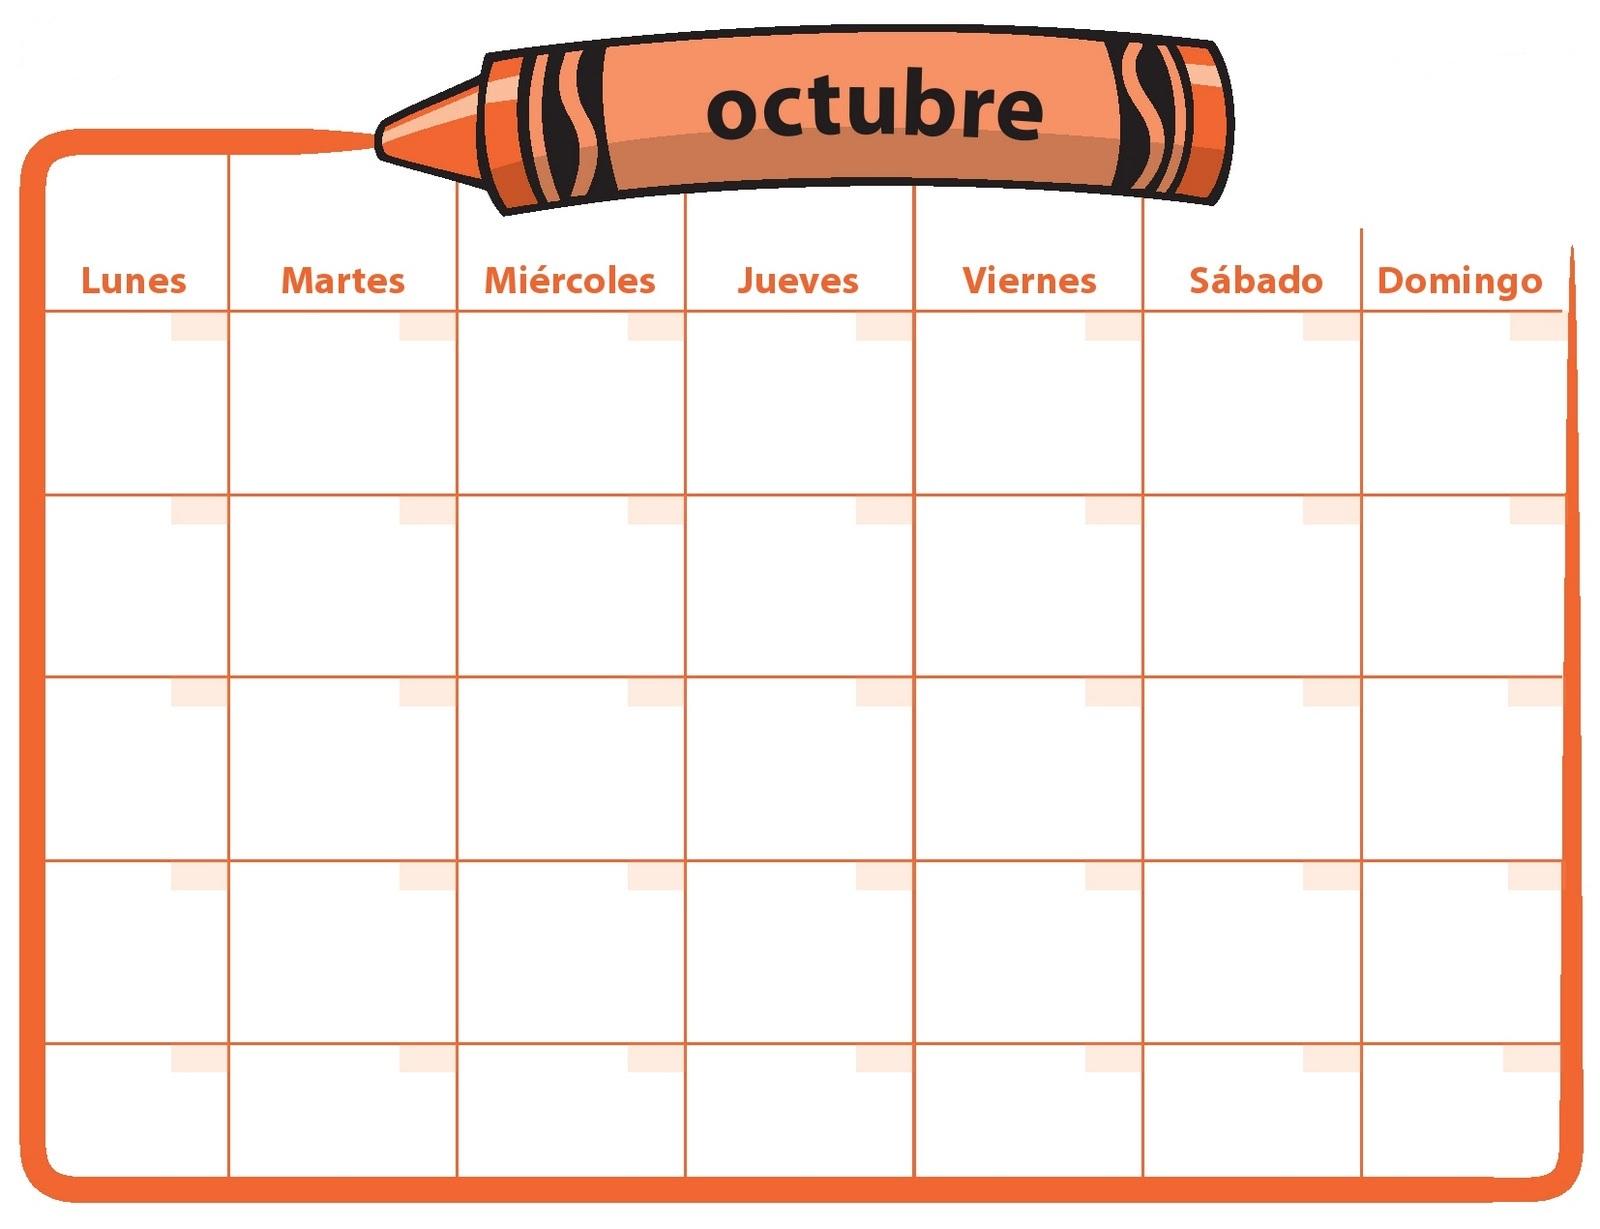 Spanish Calendar Lessons Dallas Spanish House Bilingualmommy – Page 2 – Generaci243;n Biling252;e